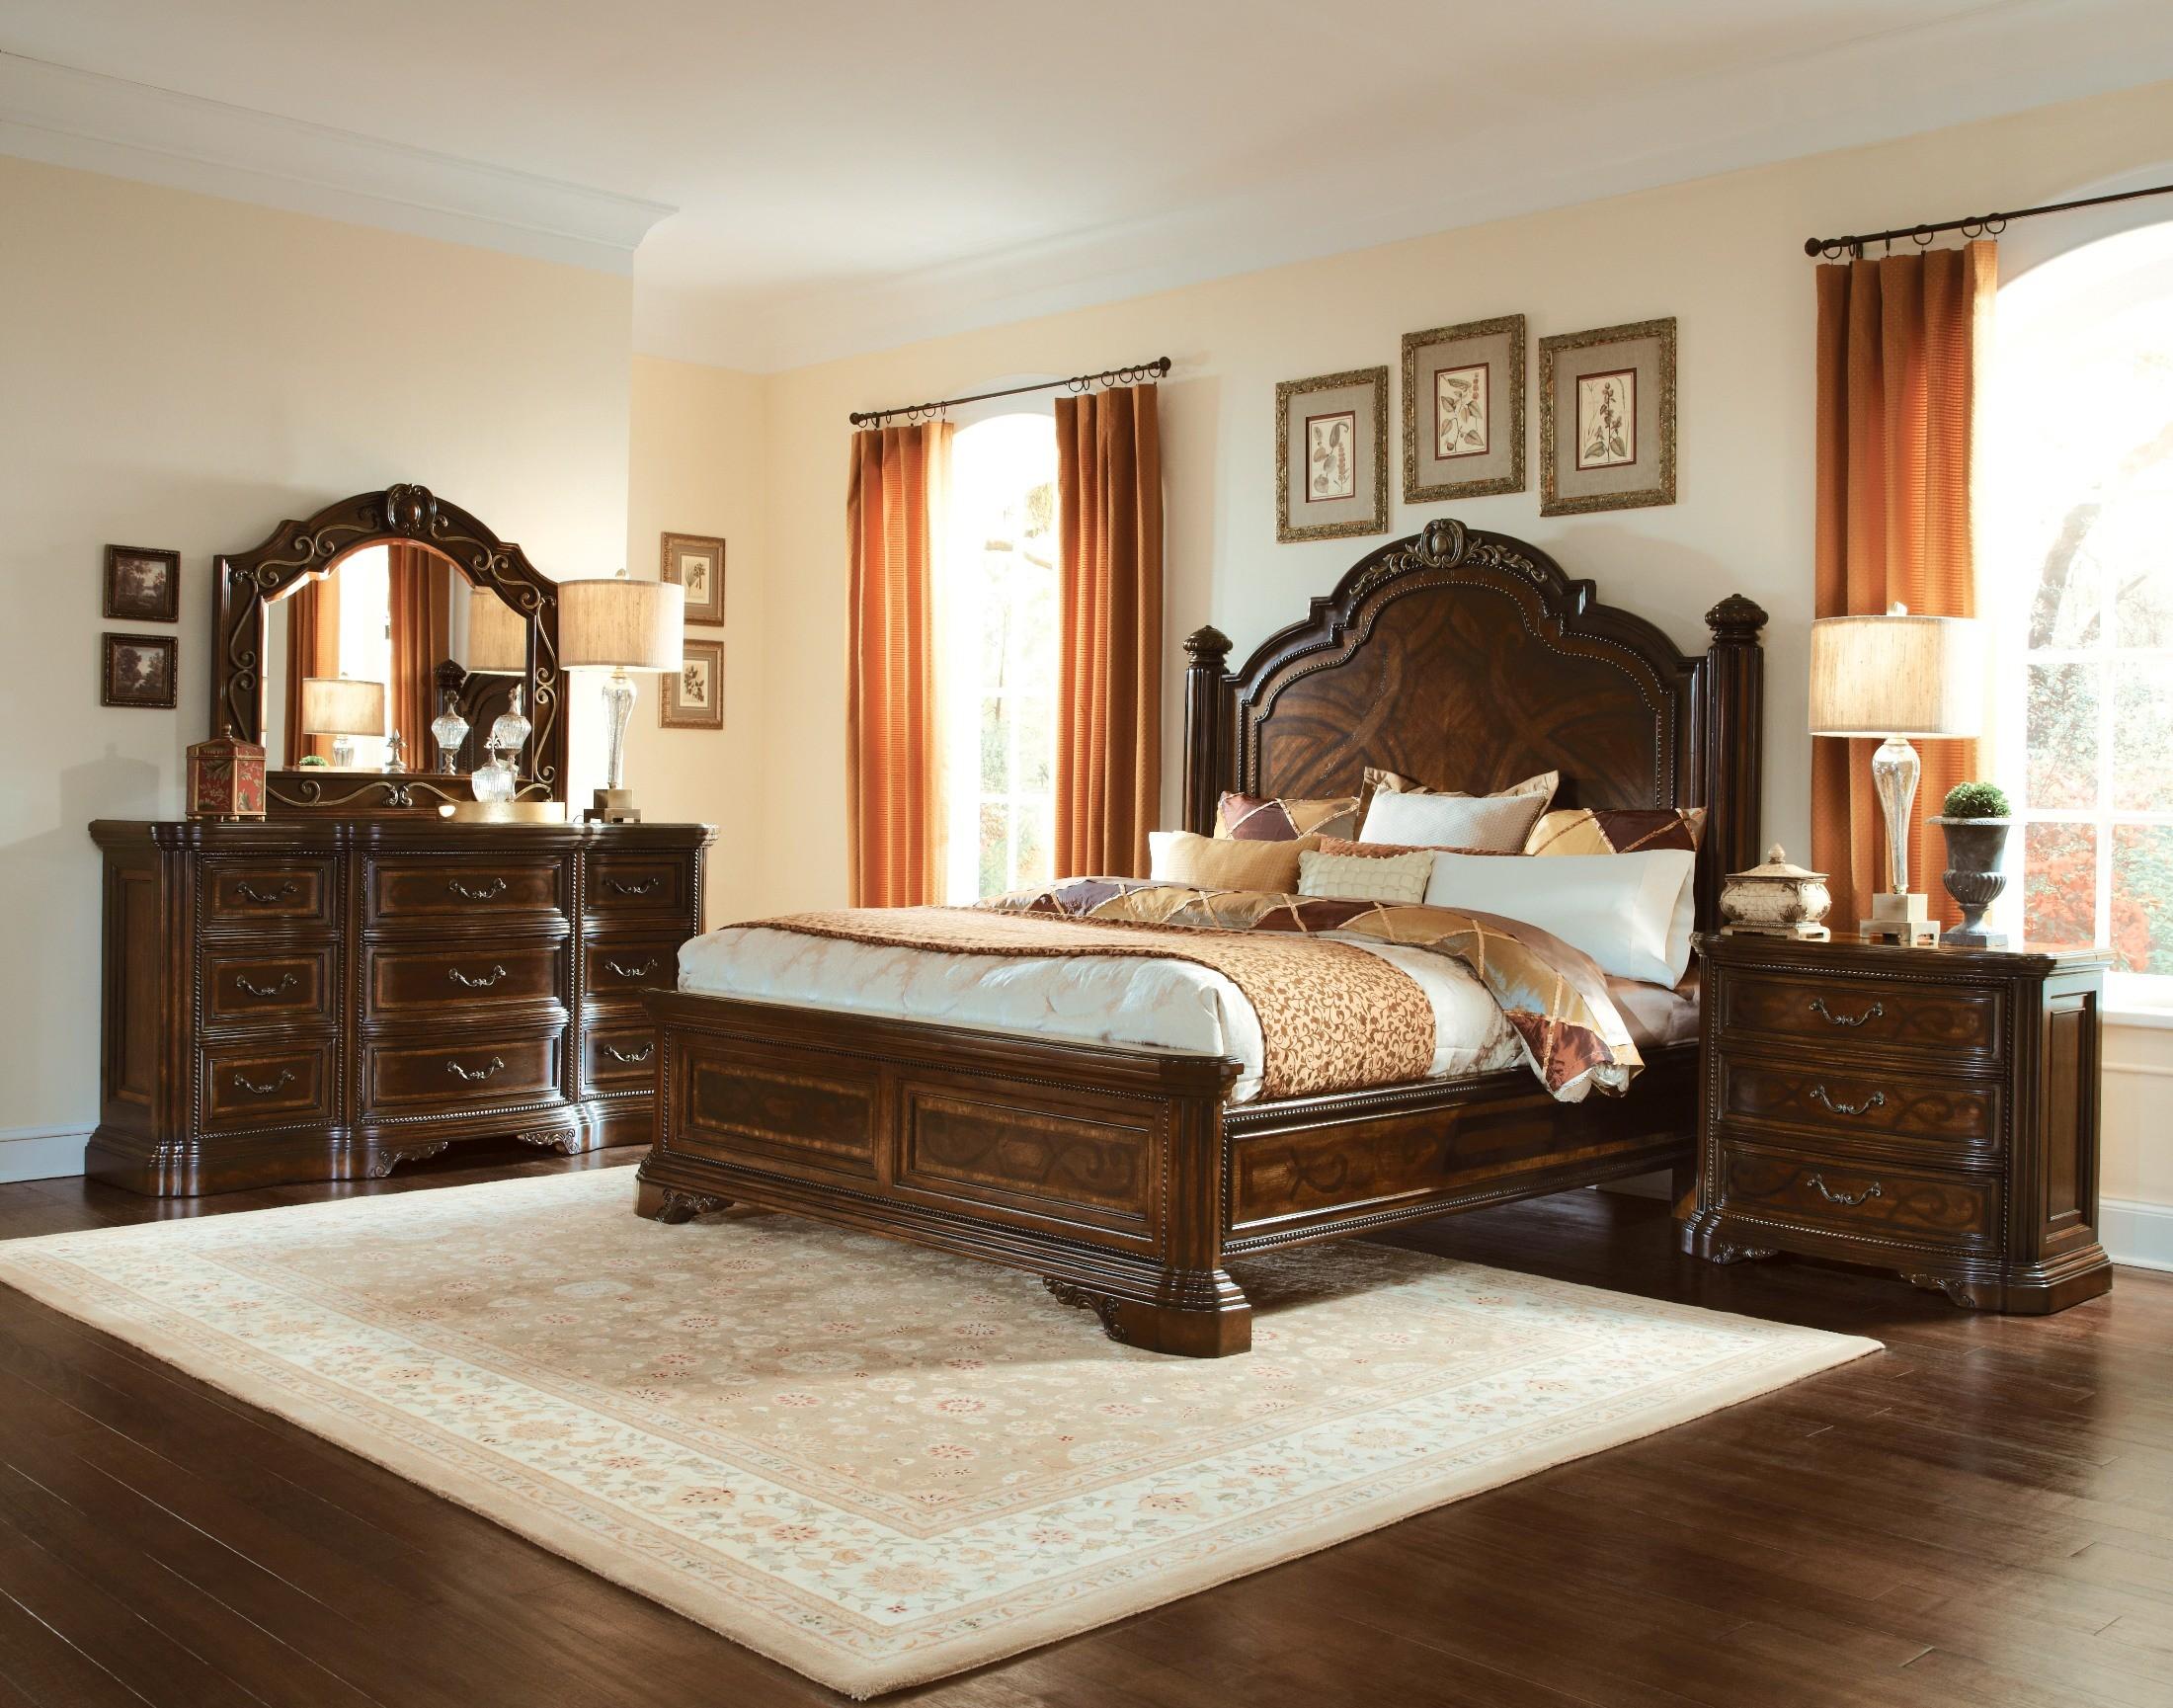 Valencia Panel Bedroom Set From Art 209125 2304 Coleman Furniture